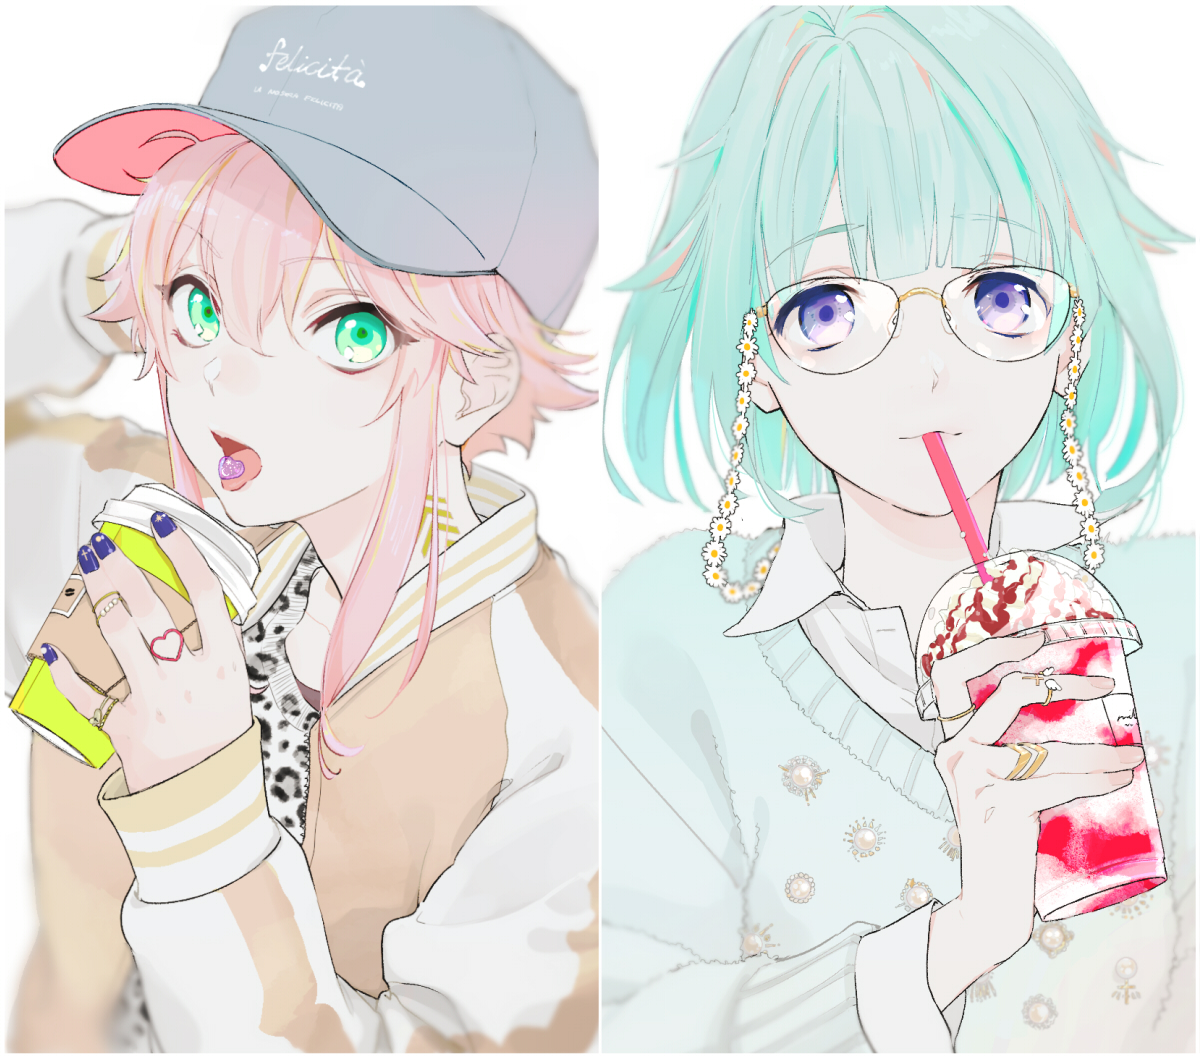 Ensemble stars zerochan anime image board for Zerochan anime